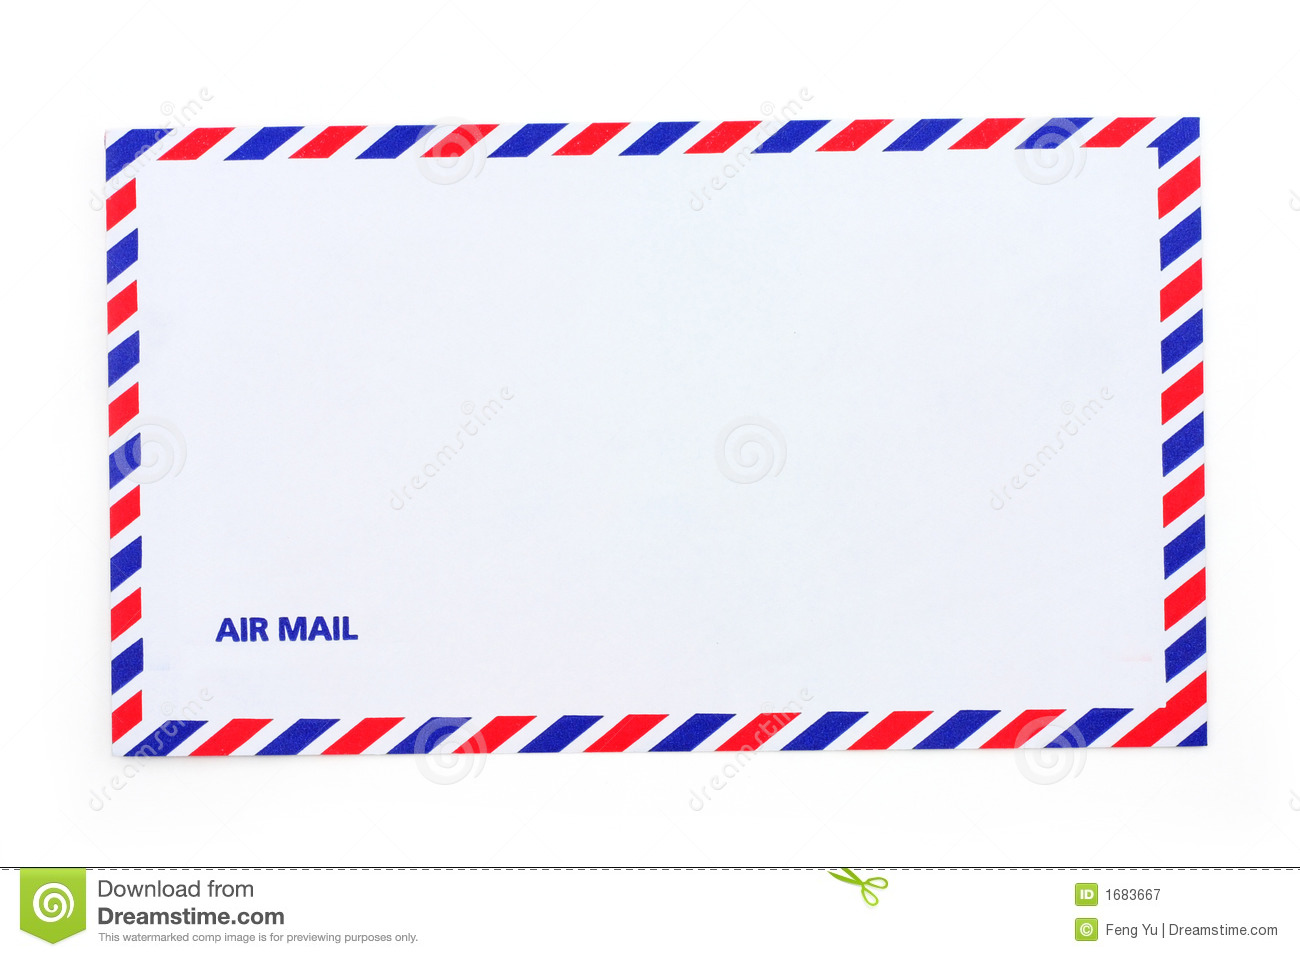 Envelope clipart international. Airmail panda free images